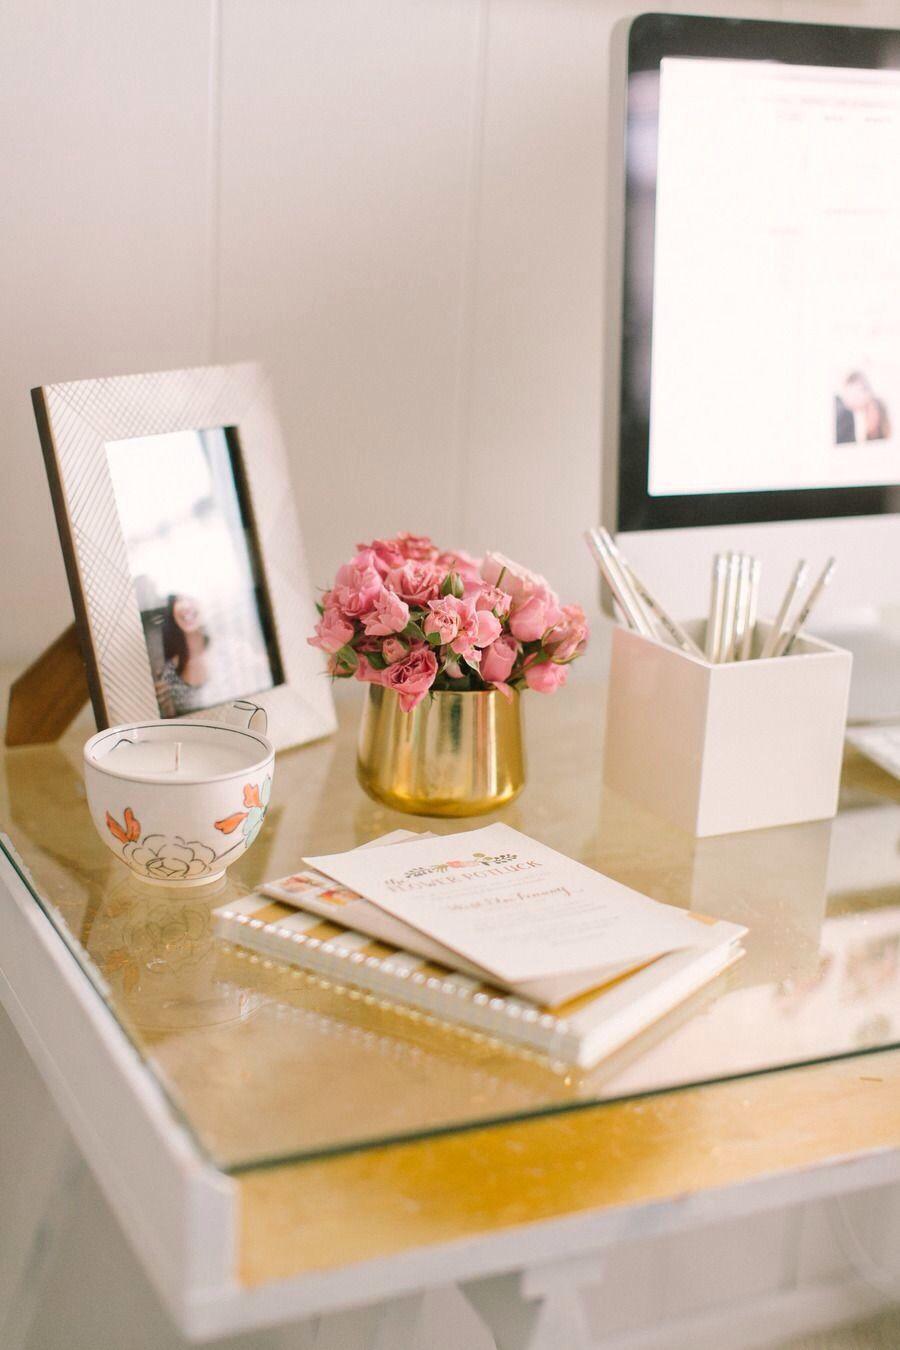 Organized & Cute Workspace : MartaBarcelonaStyle's Blog